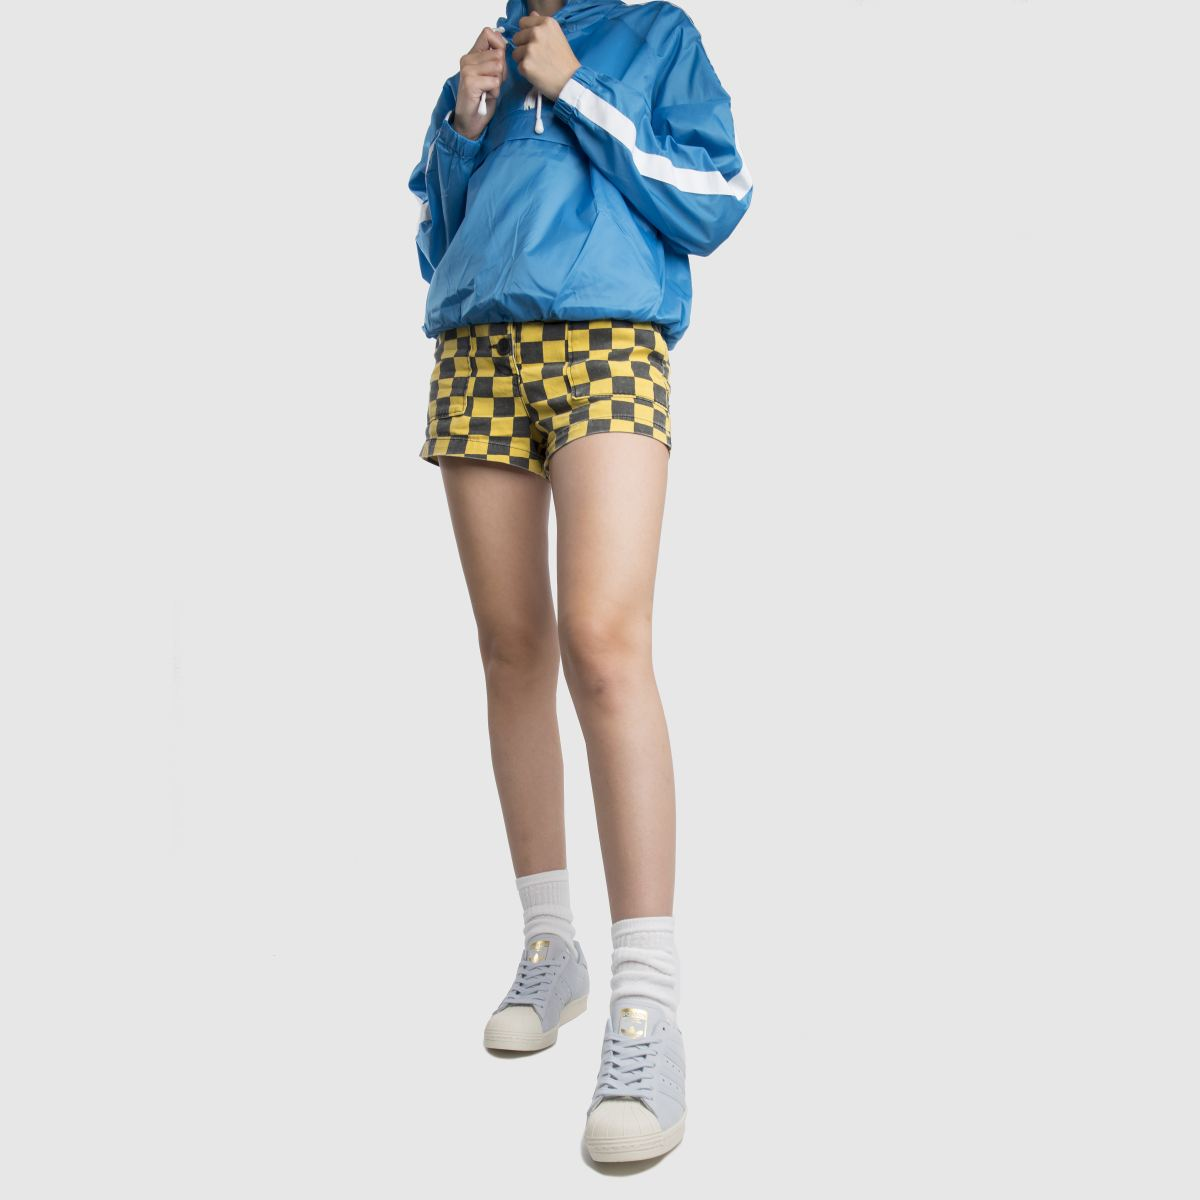 Damen Hellblau adidas Superstar beliebte Sneaker | schuh Gute Qualität beliebte Superstar Schuhe 409a77